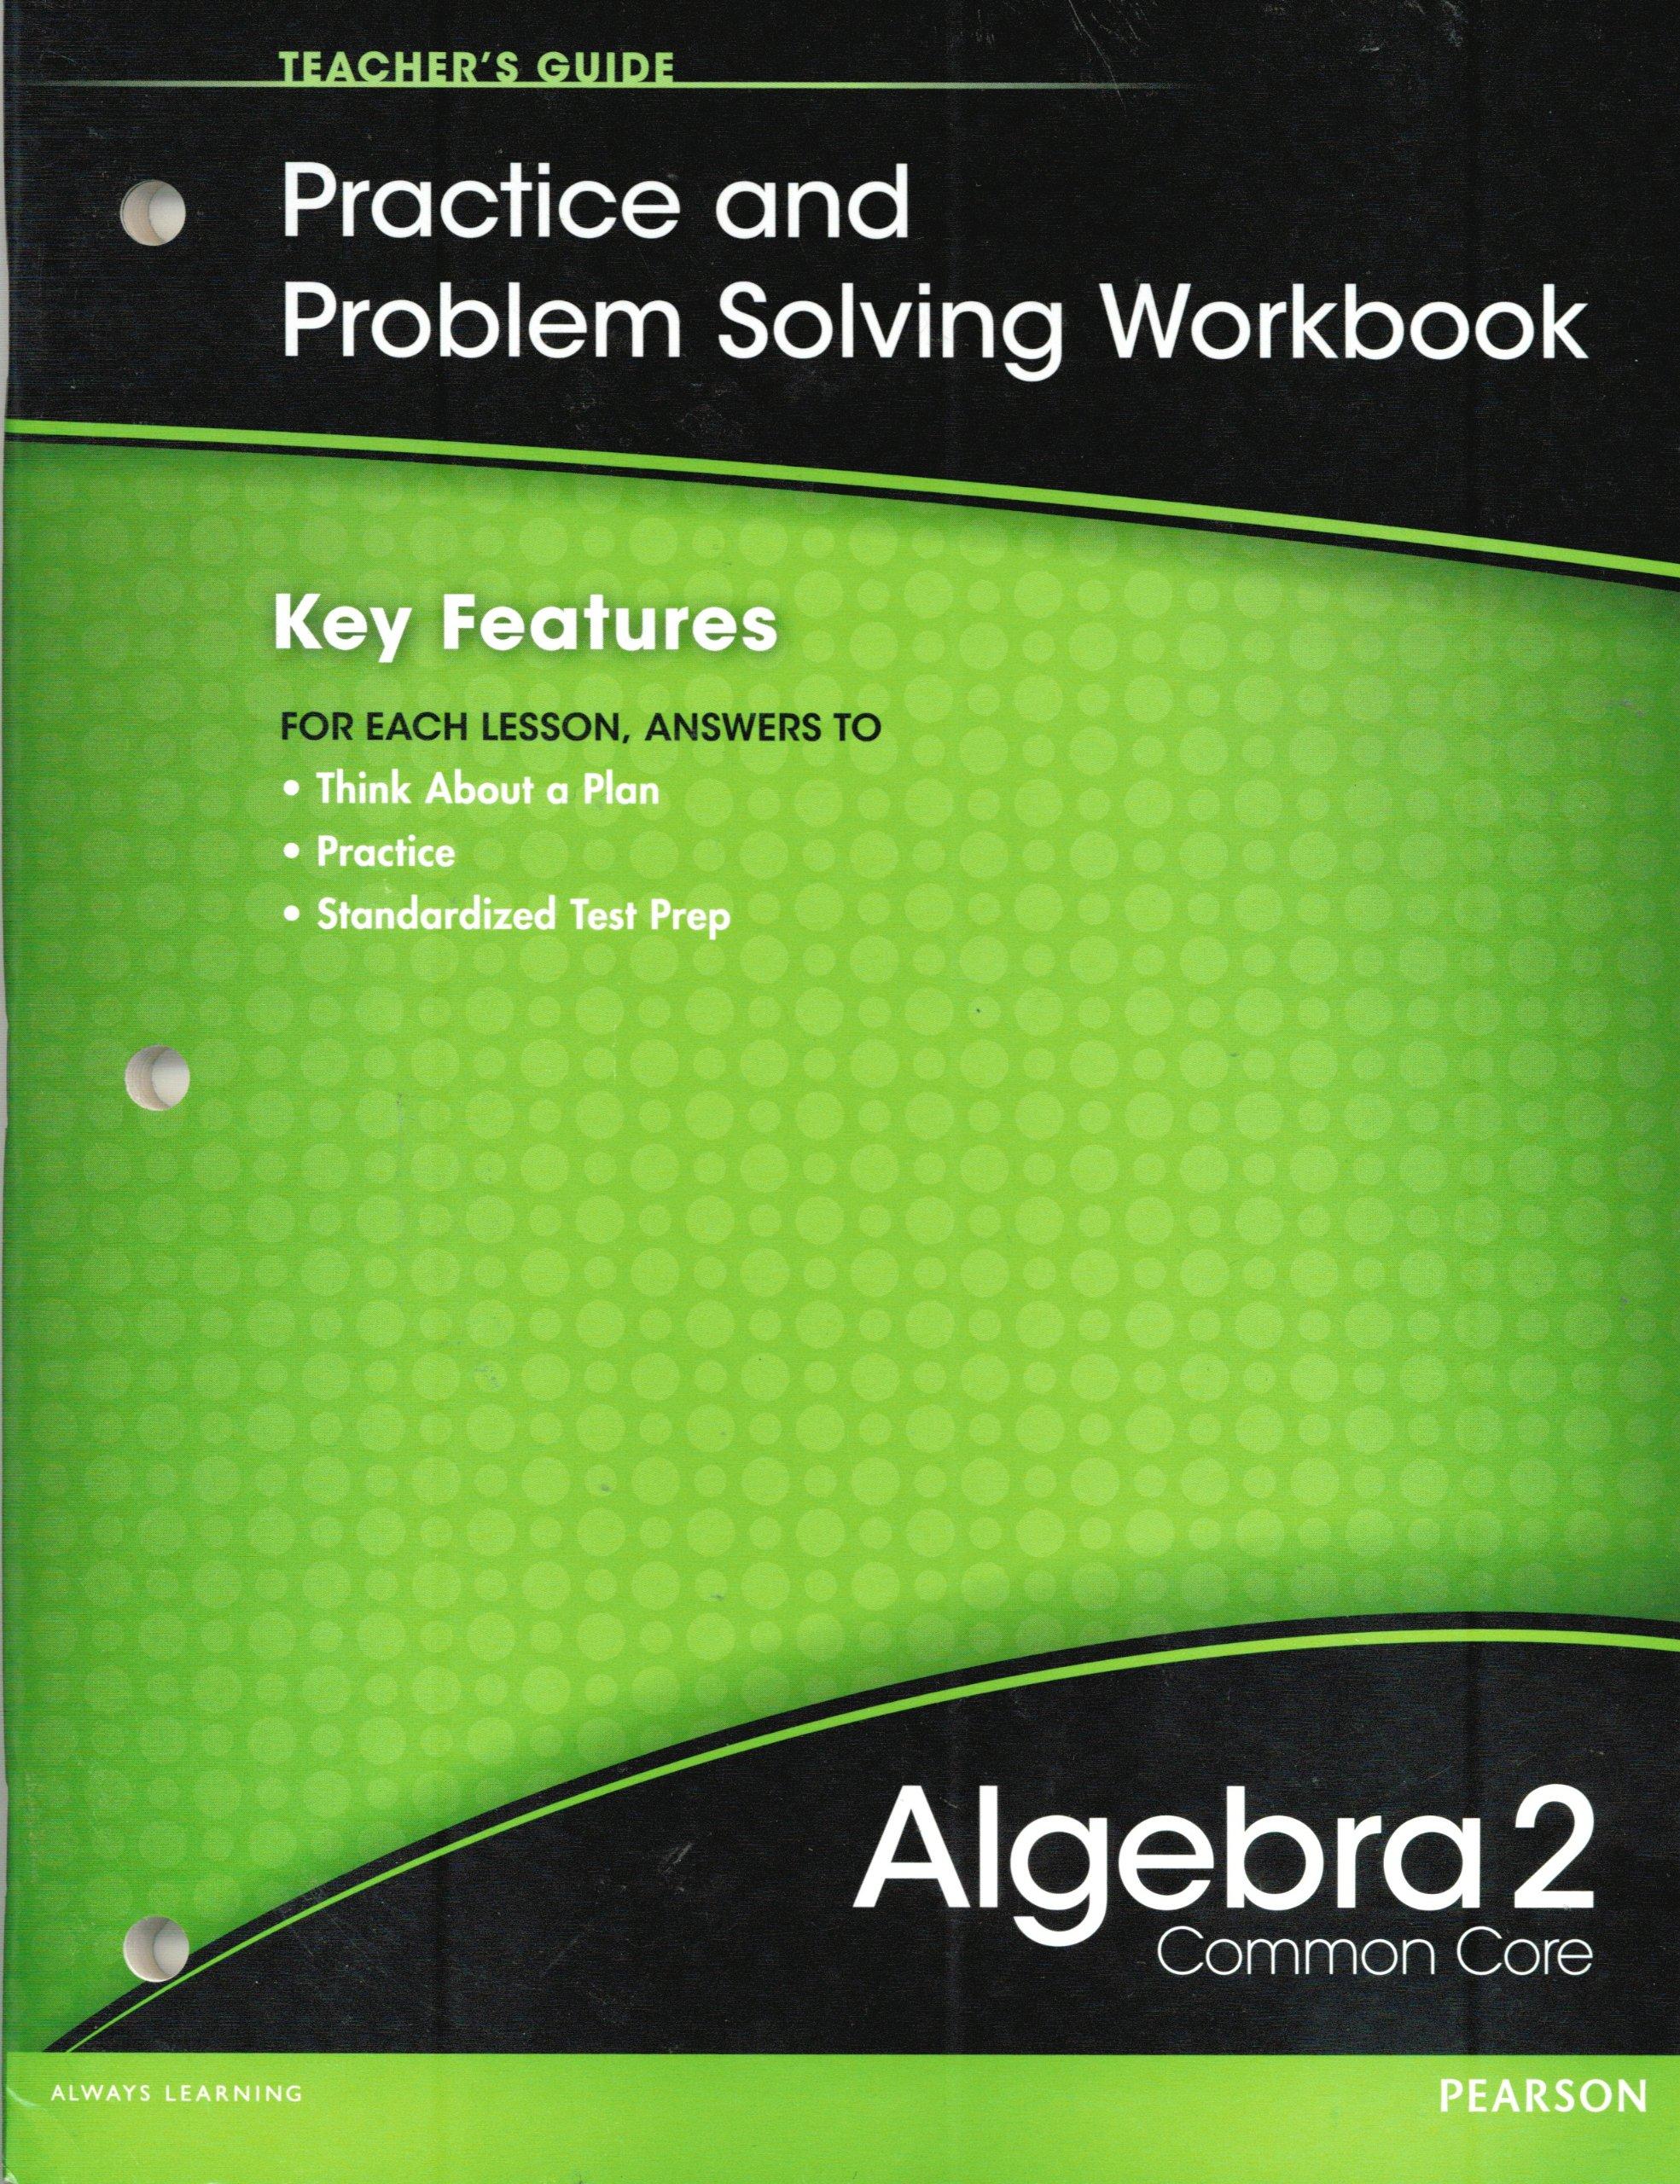 Pearson Algebra 1 Textbook Pdf Answers